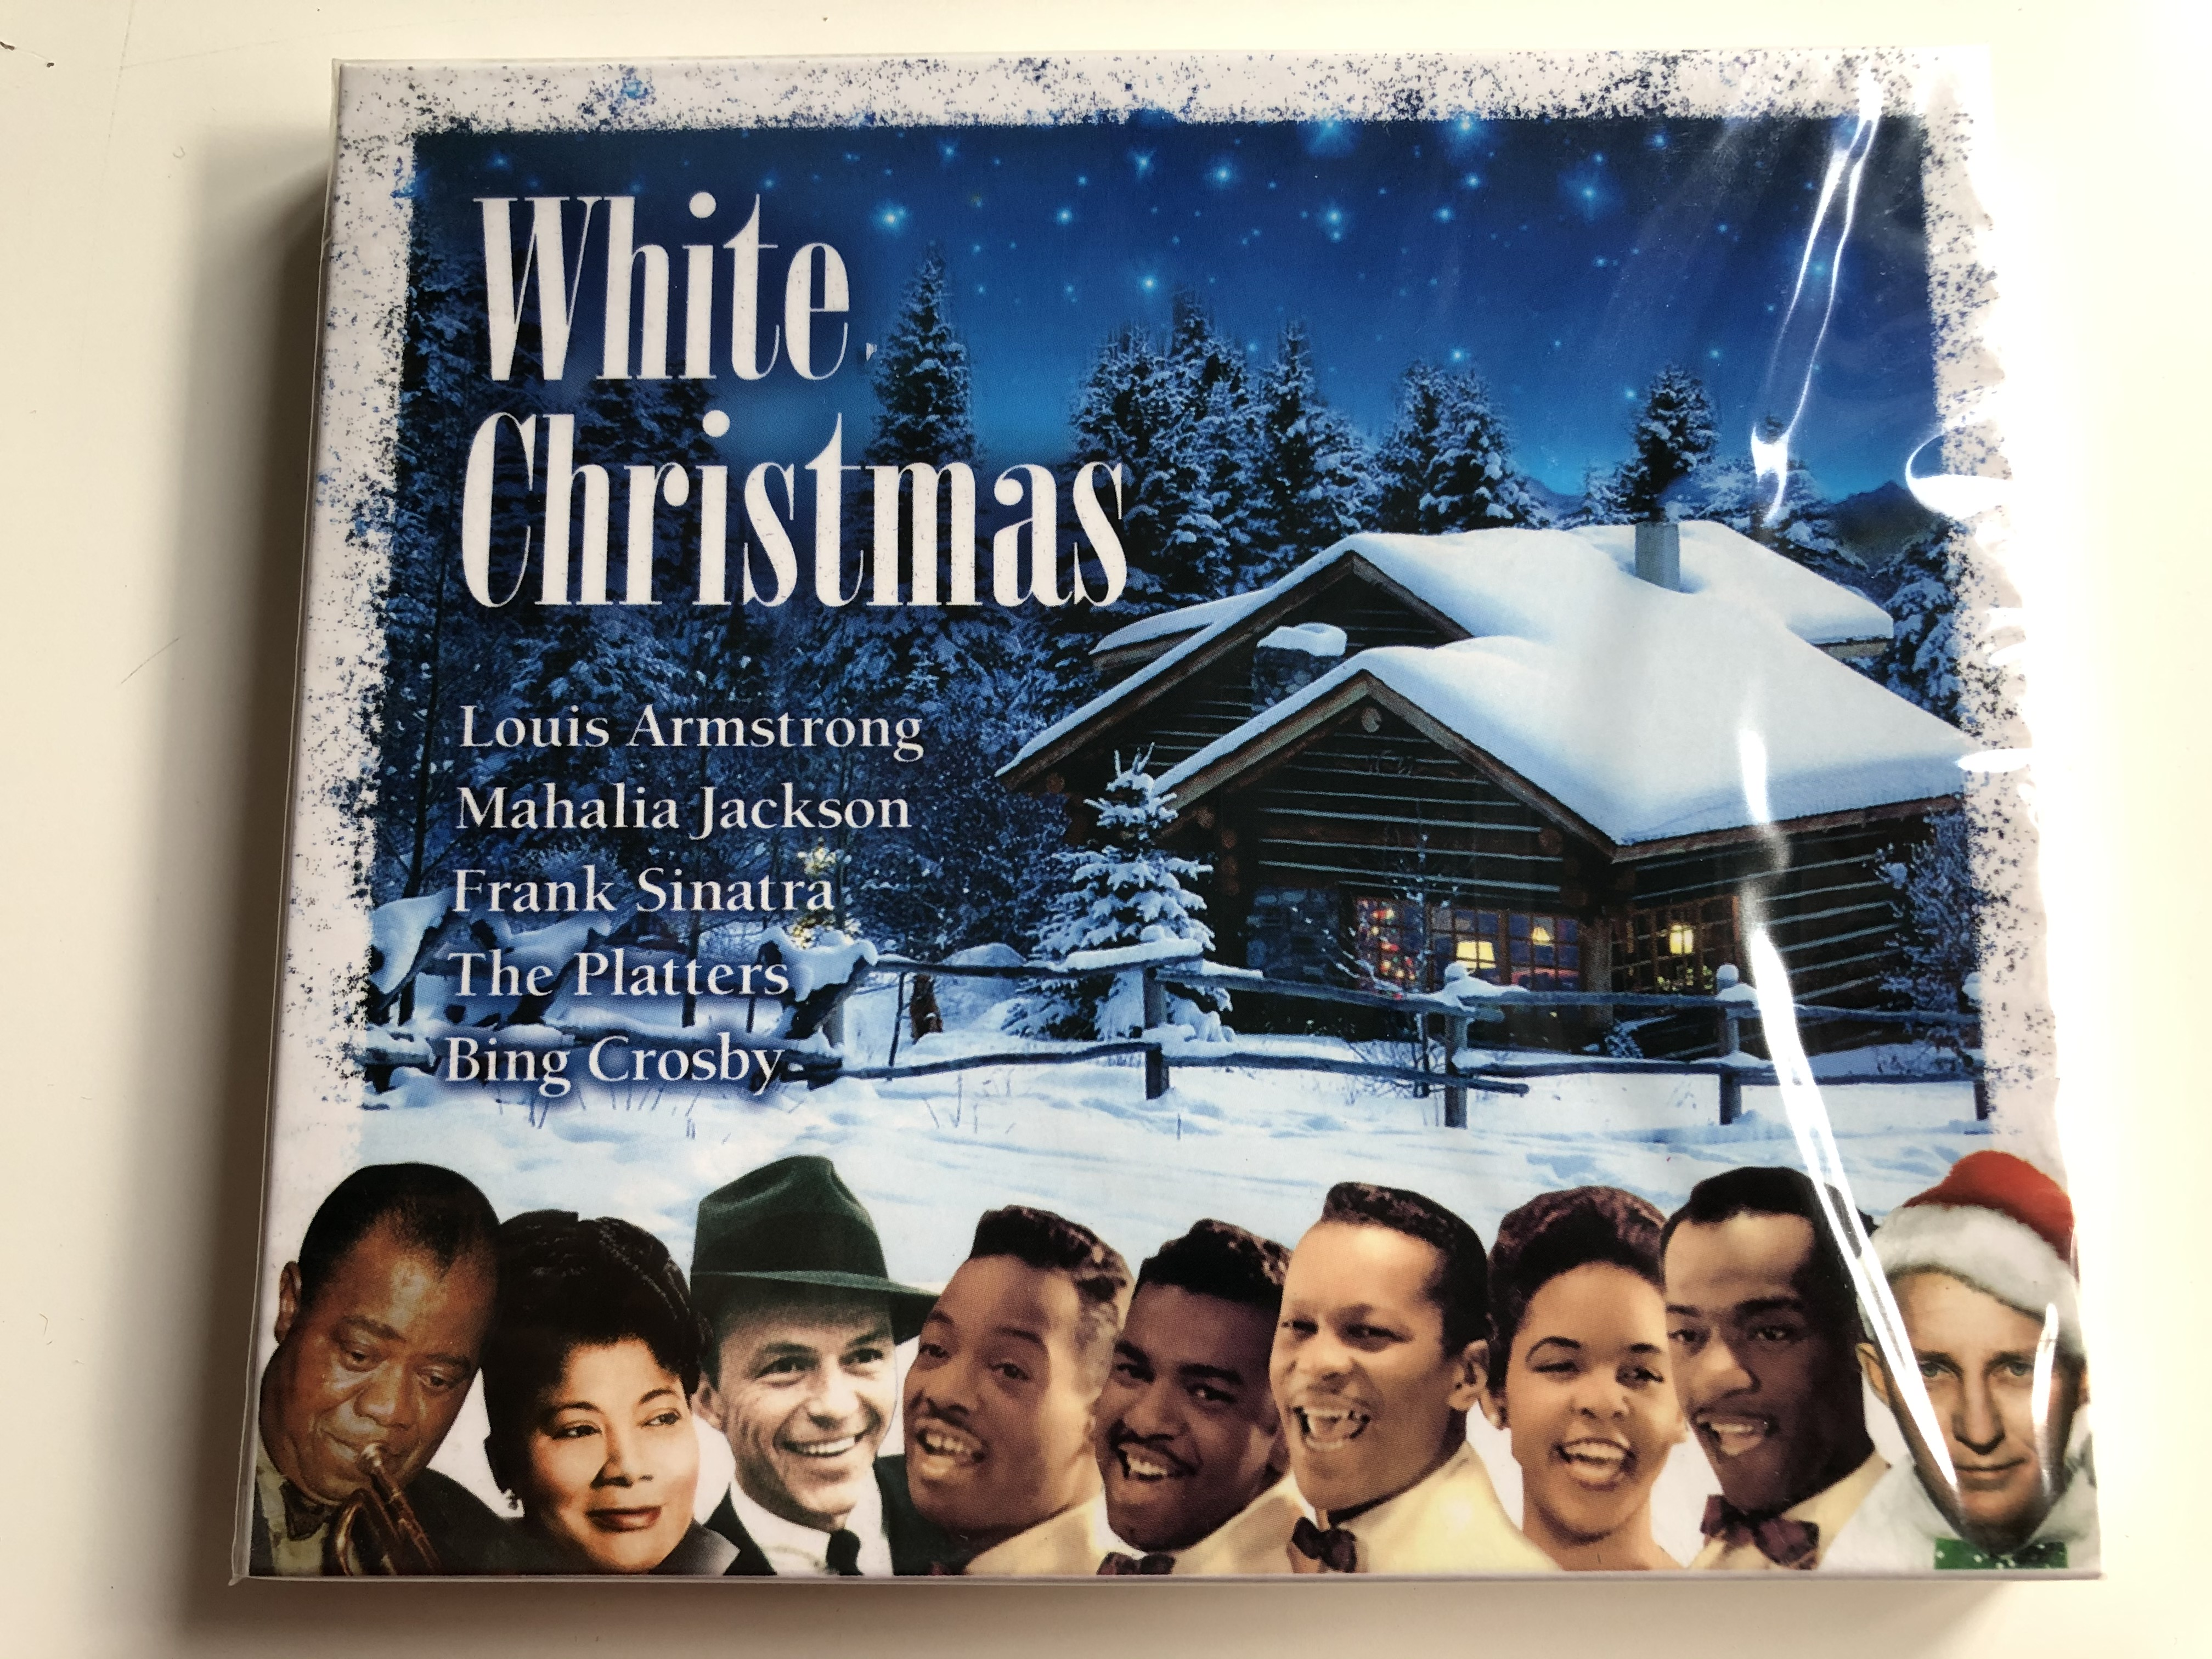 white-christmas-louis-armstrong-mahalia-jackson-frank-sinatra-the-platters-bing-crosby-lmm-audio-cd-2007-1396992-1-.jpg